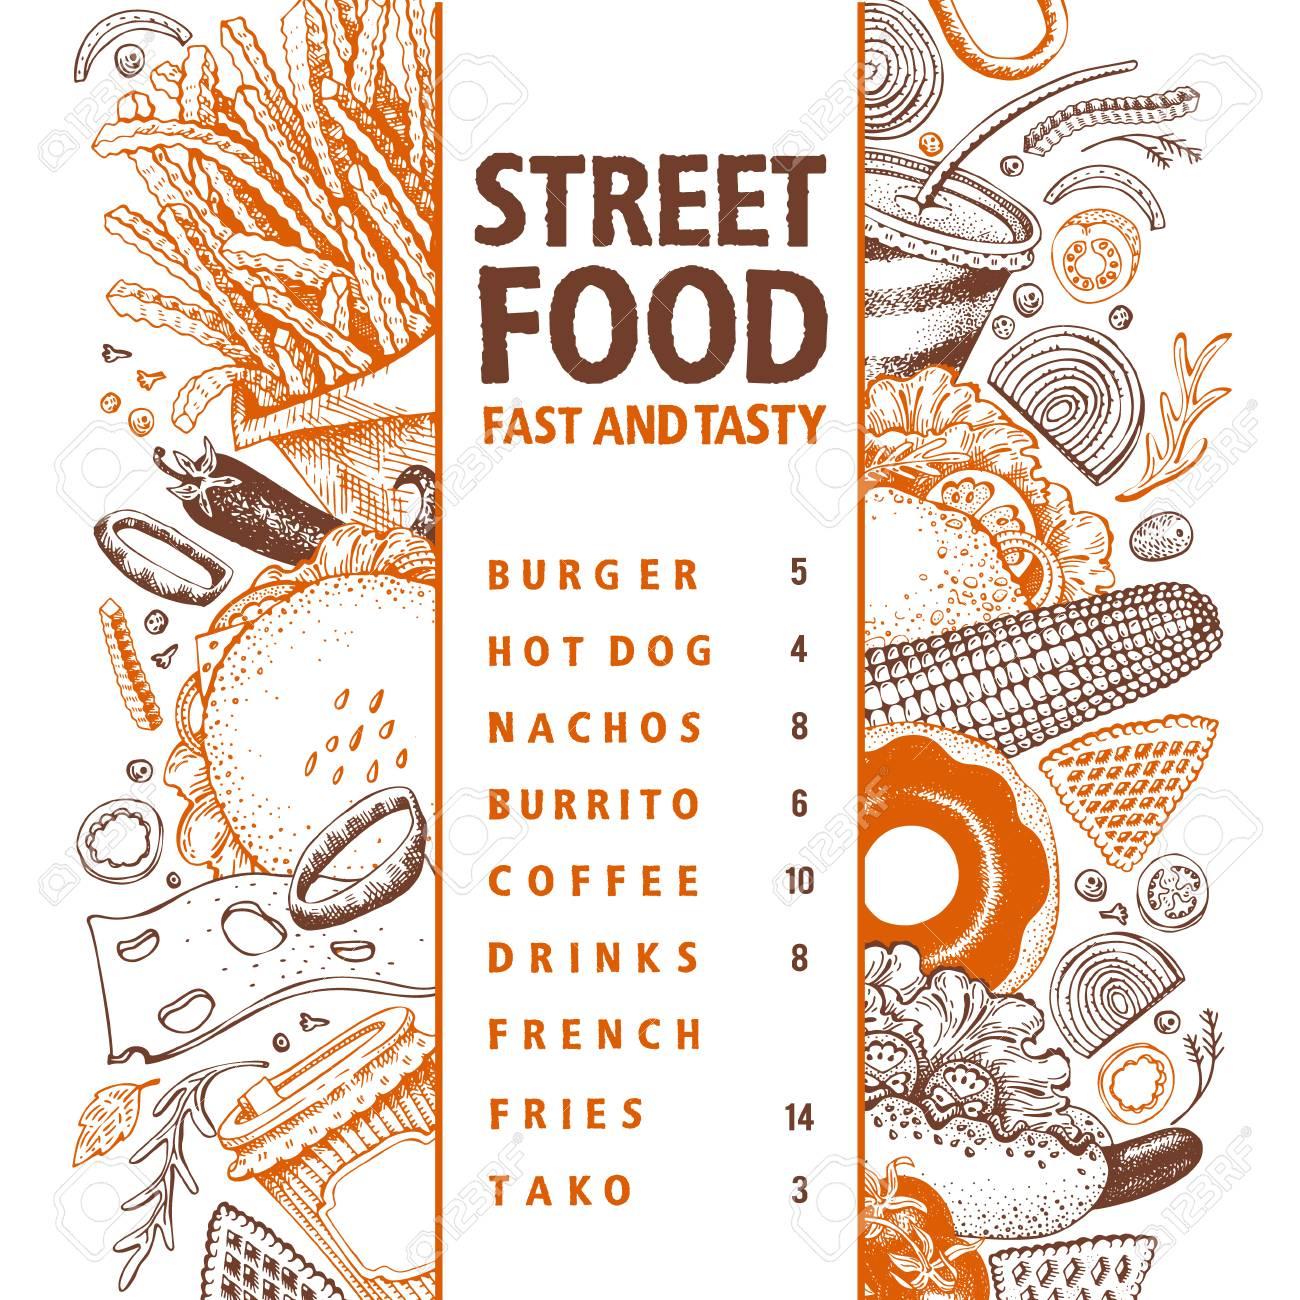 Fast Food Hand Drawn Vector Illustration Street Food Banner